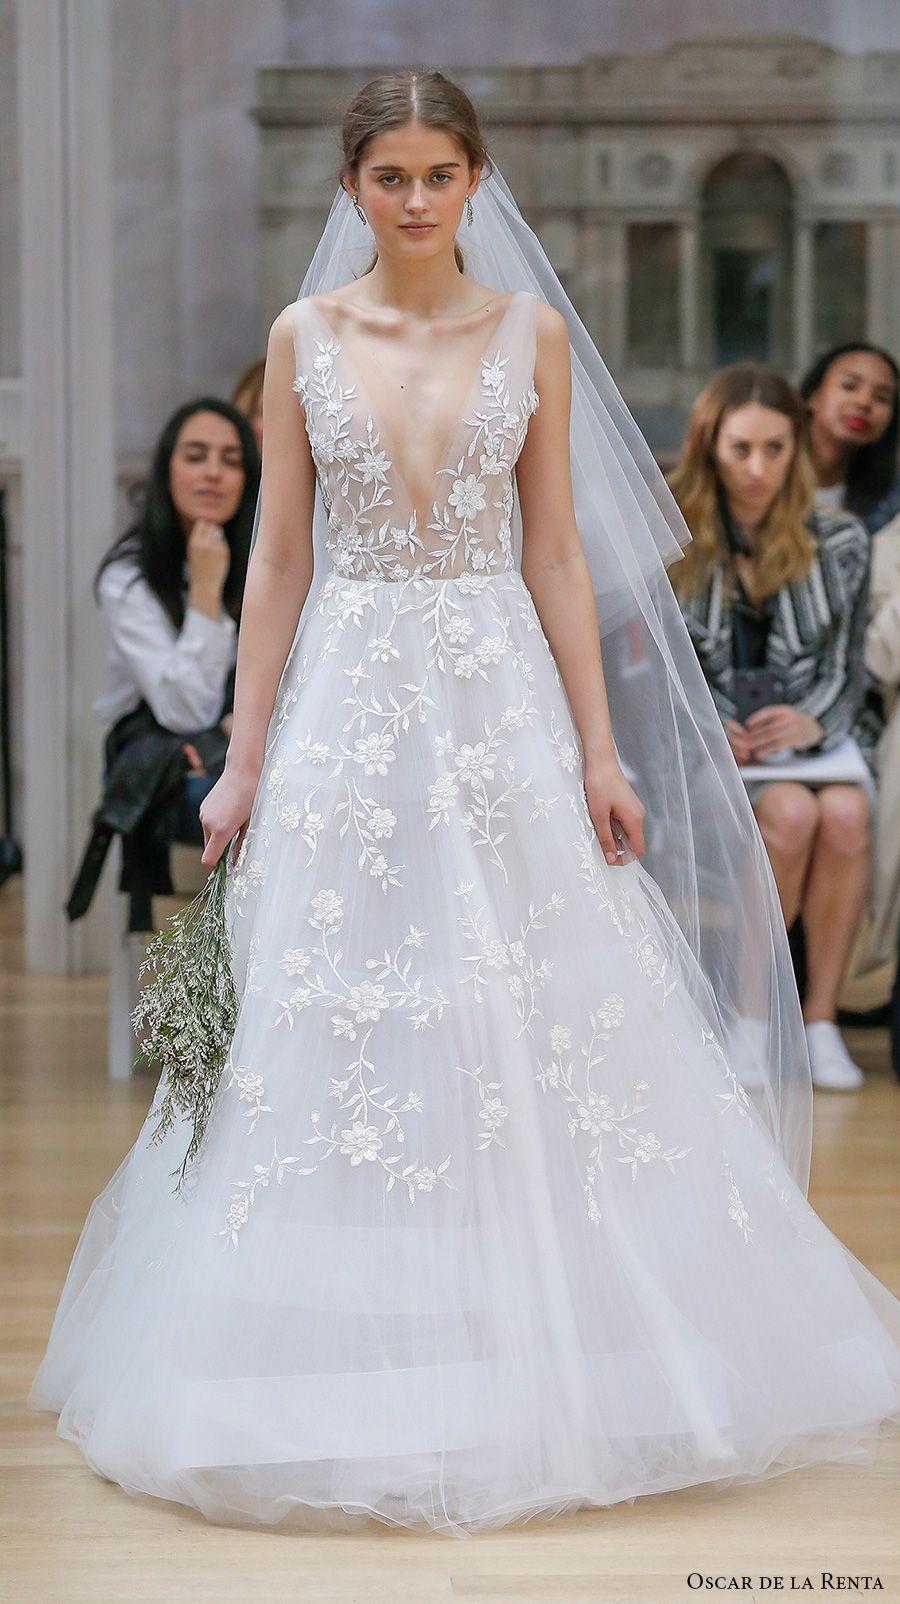 Oscar de la renta spring 2018 wedding dresses new york for De la renta wedding dresses